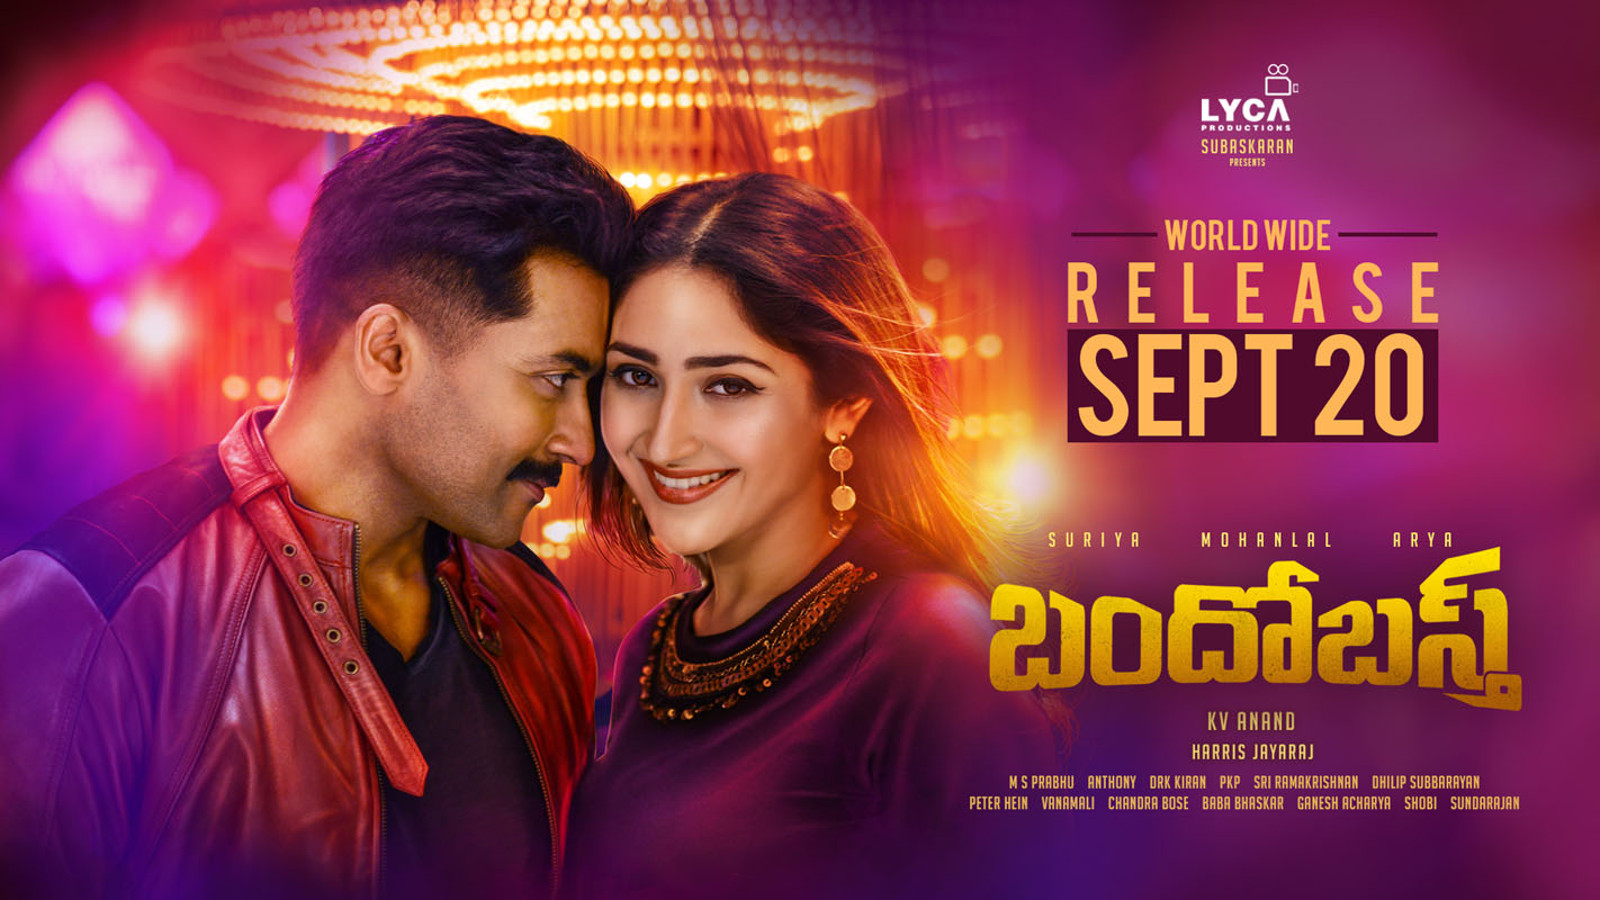 Suriya Sayesha Bandobast movie release date on September 20